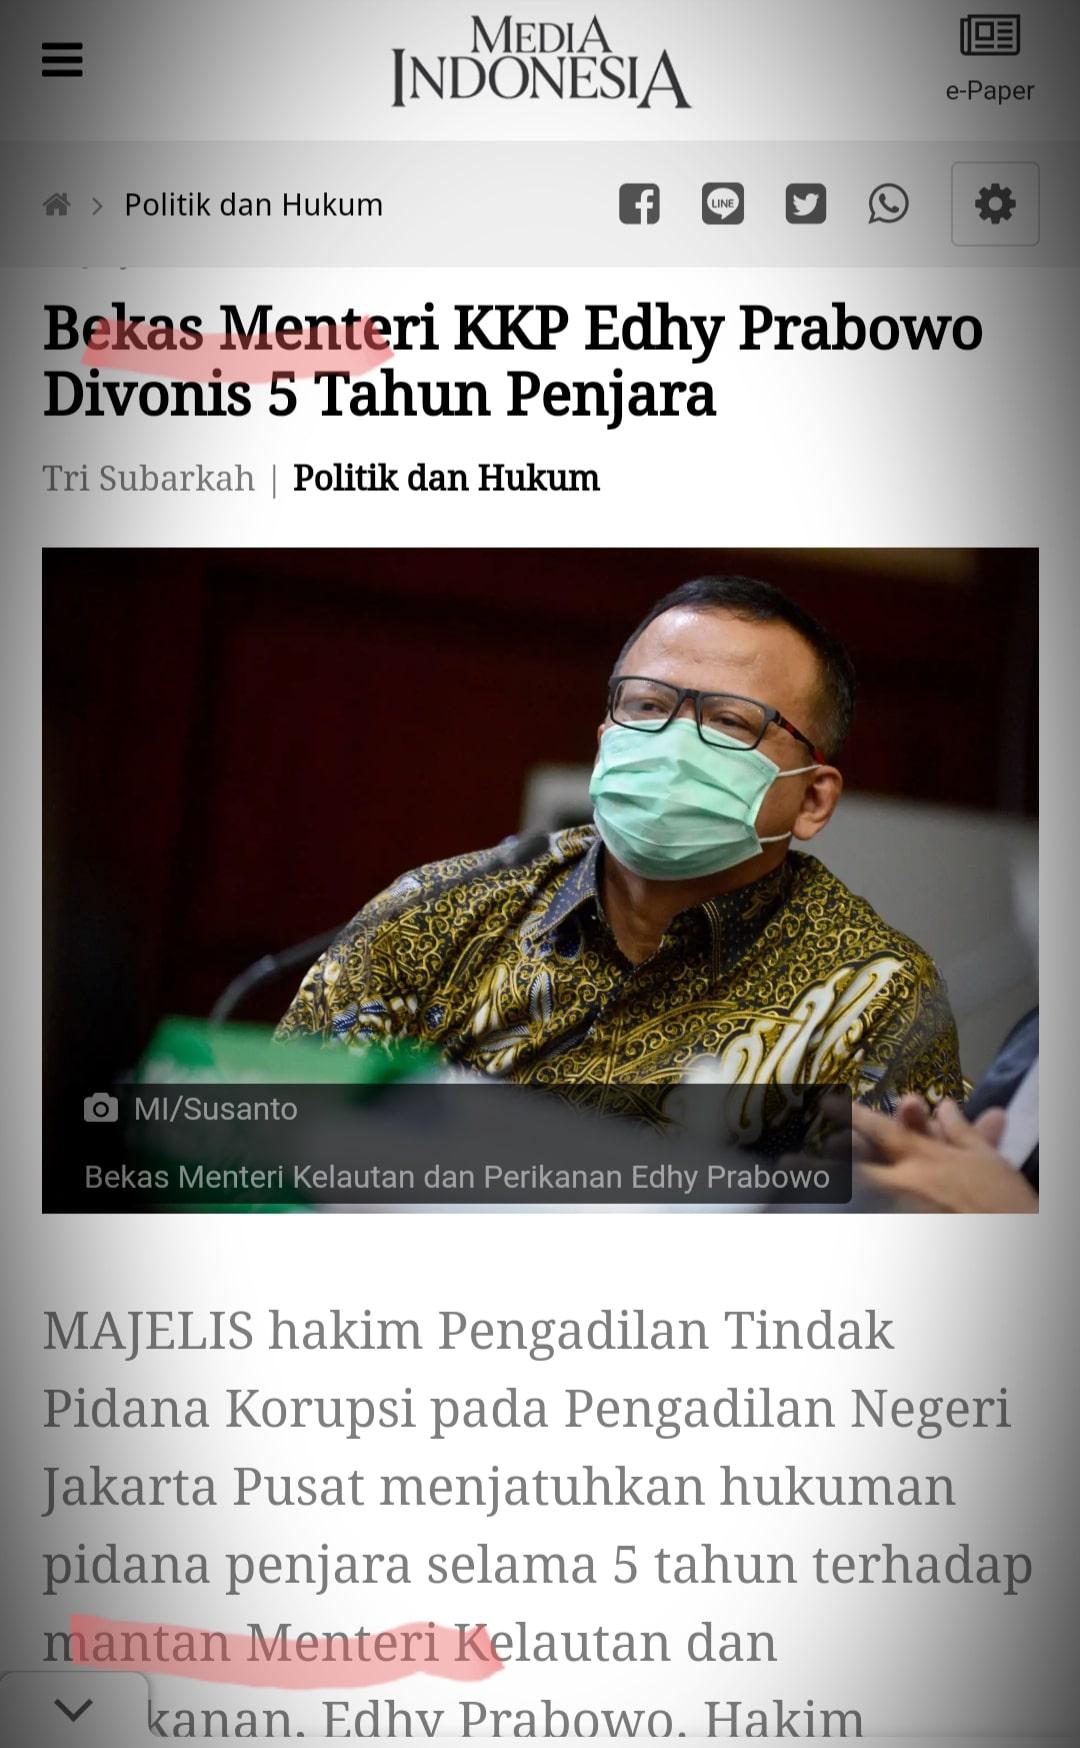 Penyebutan bekas menteri, bukan mantan menteri, itu boleh, tak melanggar hukum